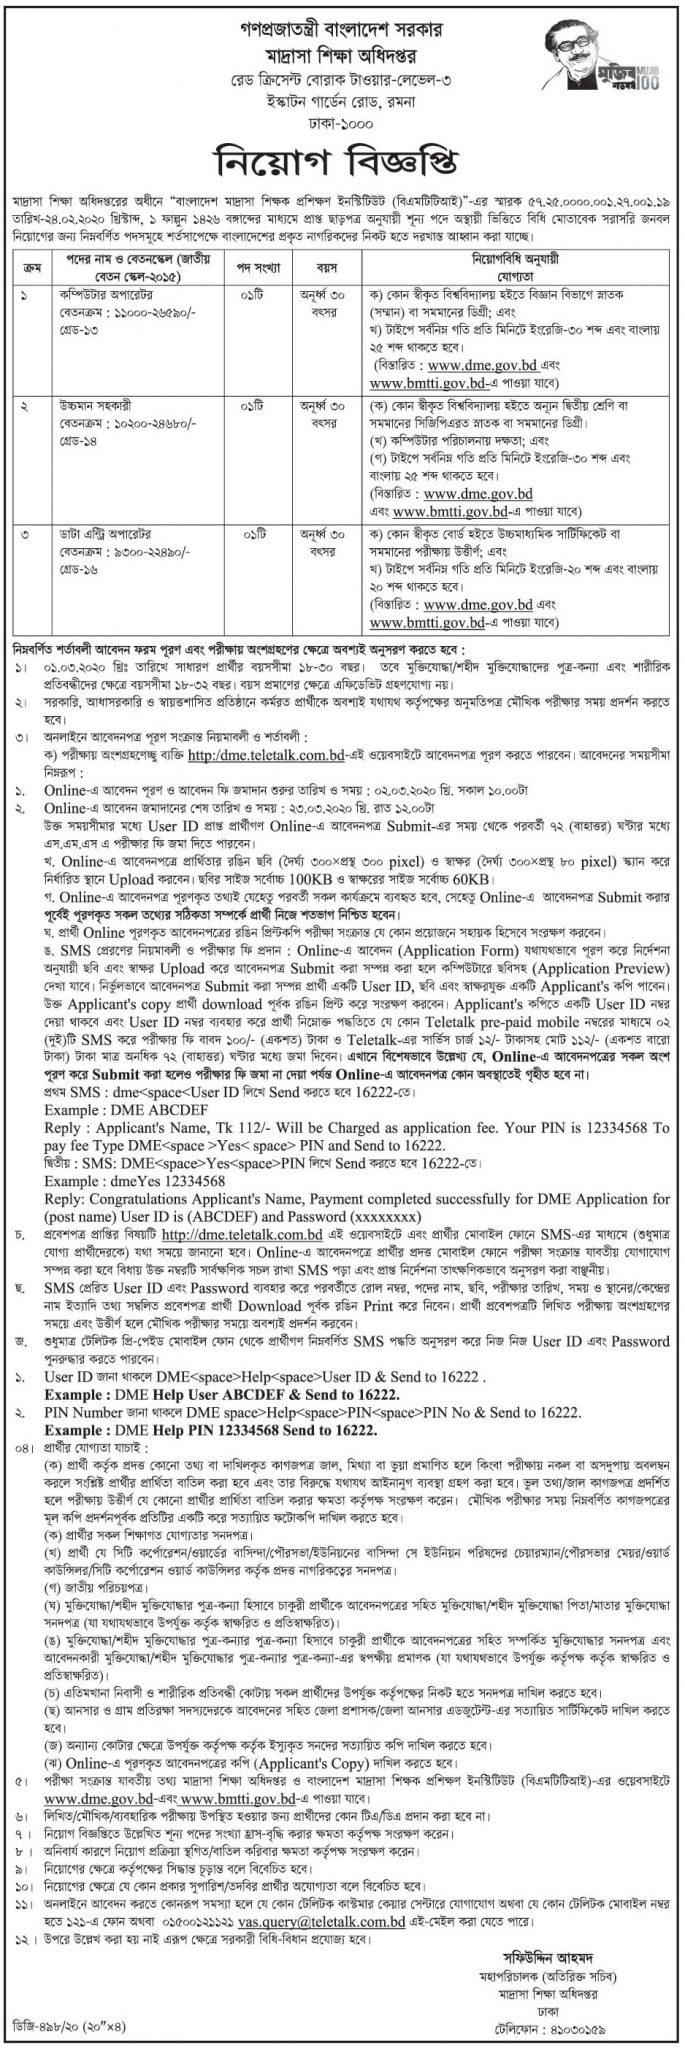 Bangladesh Madrasah Education Board Job Circular 2020